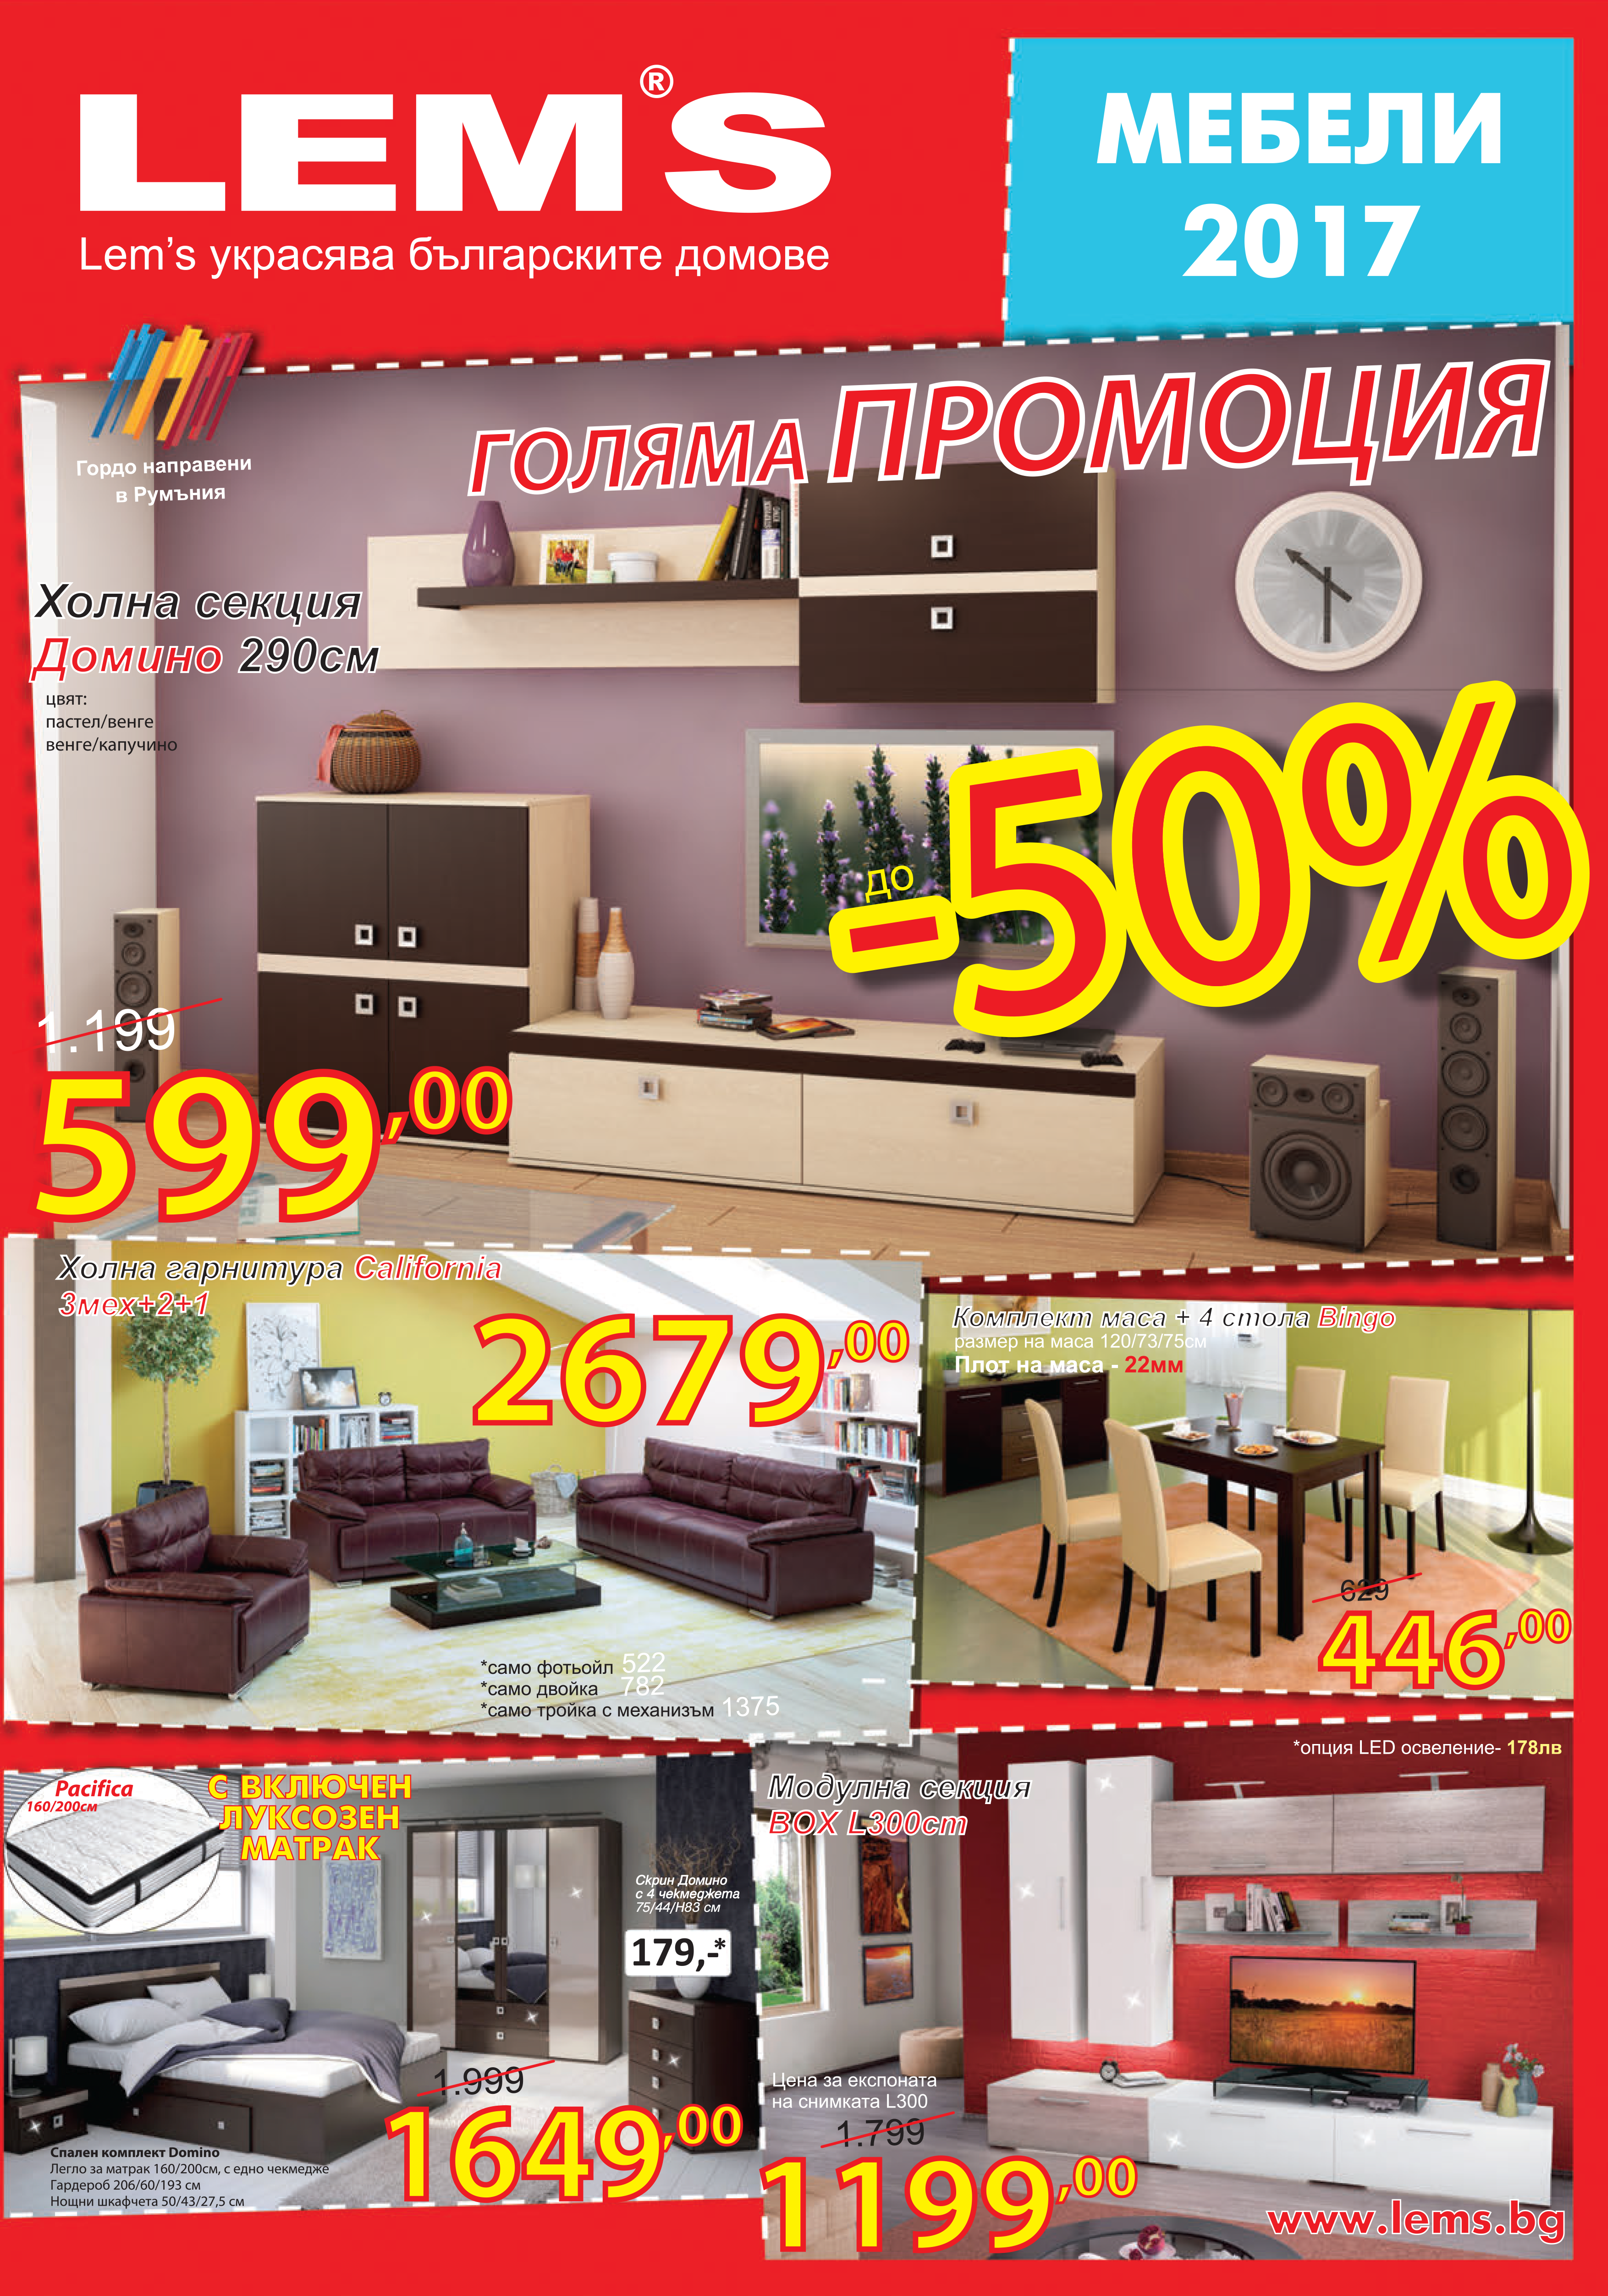 Мебели в Пловдив - Брошура Лемет